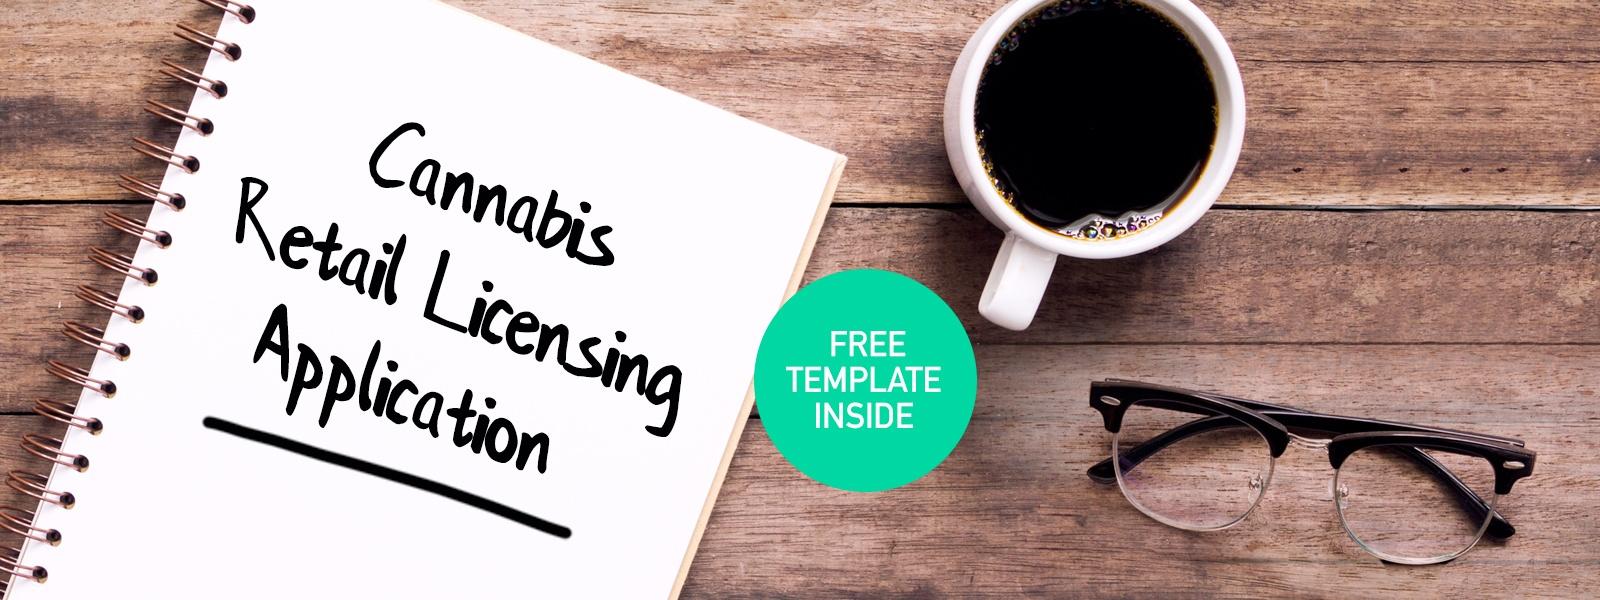 Cova-Licensing-Application-Template-LandingPage.jpg